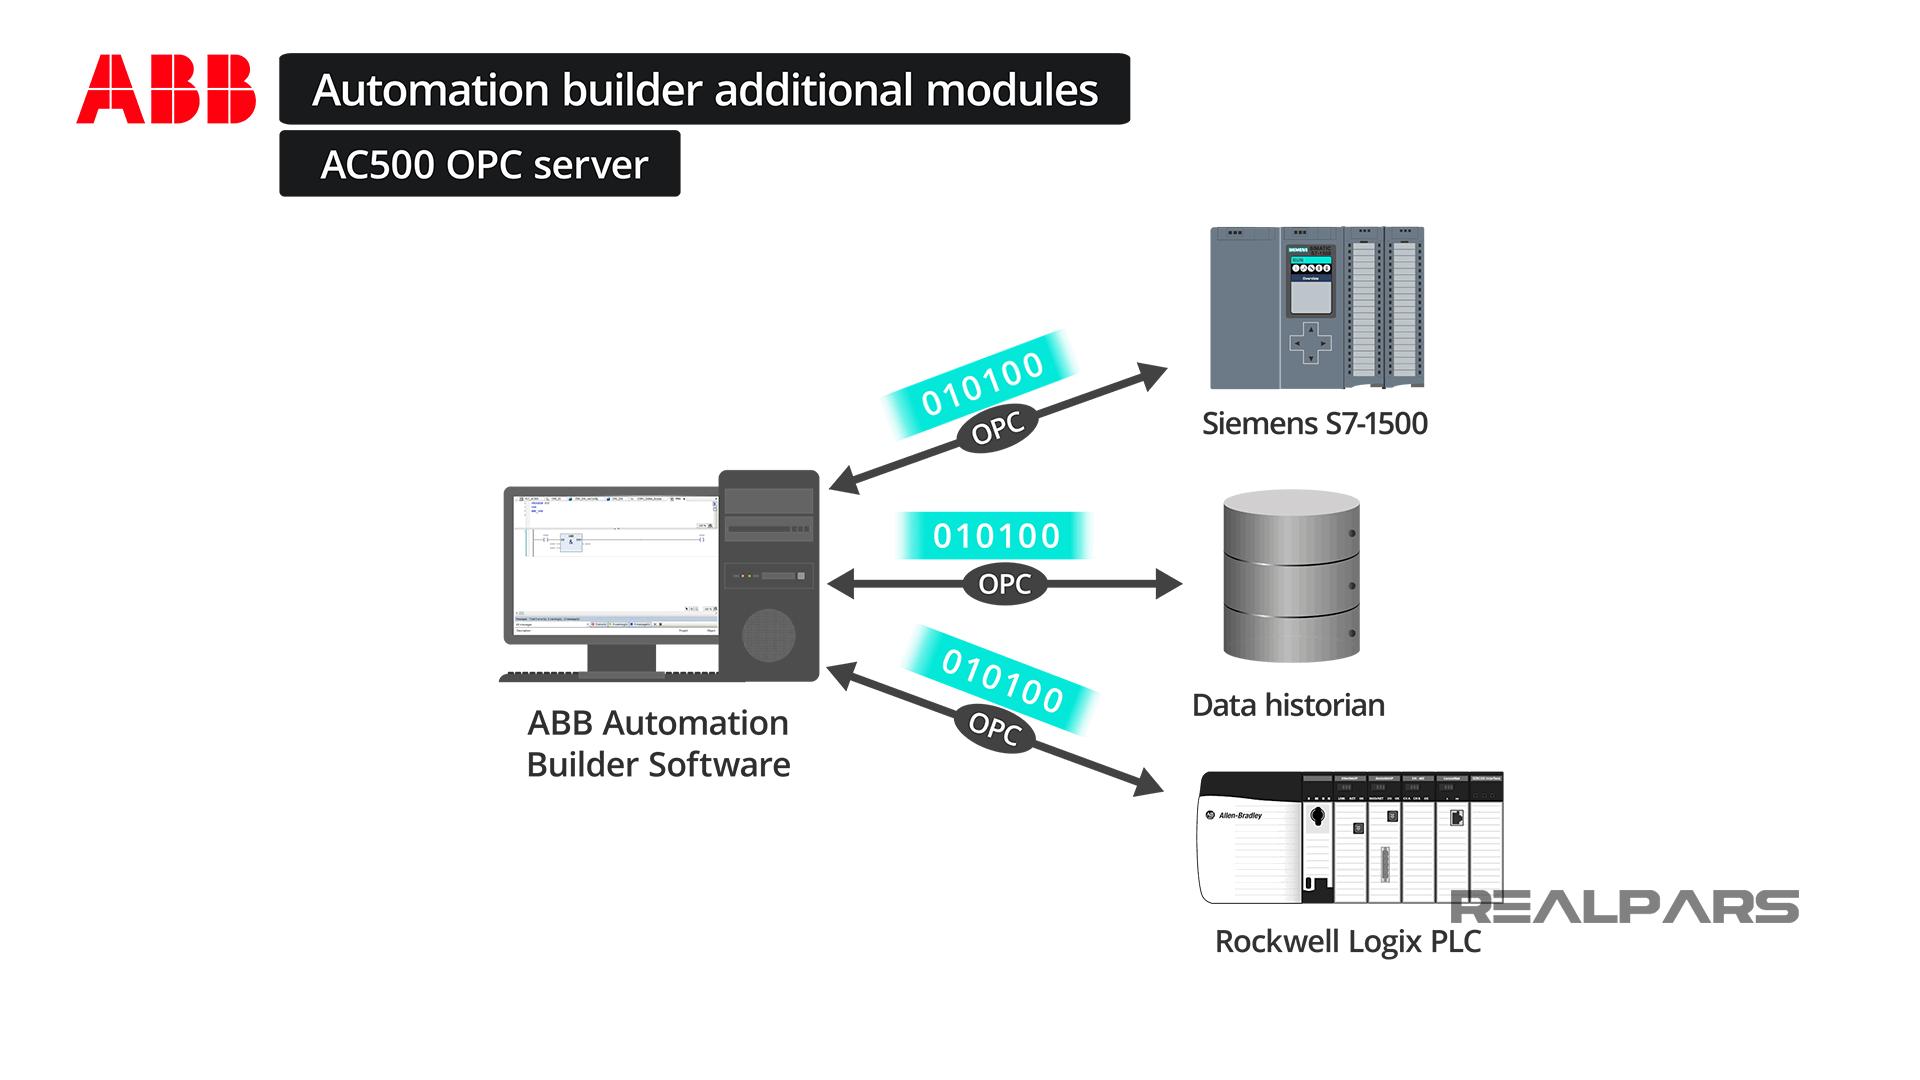 AC500 OPC Server Application